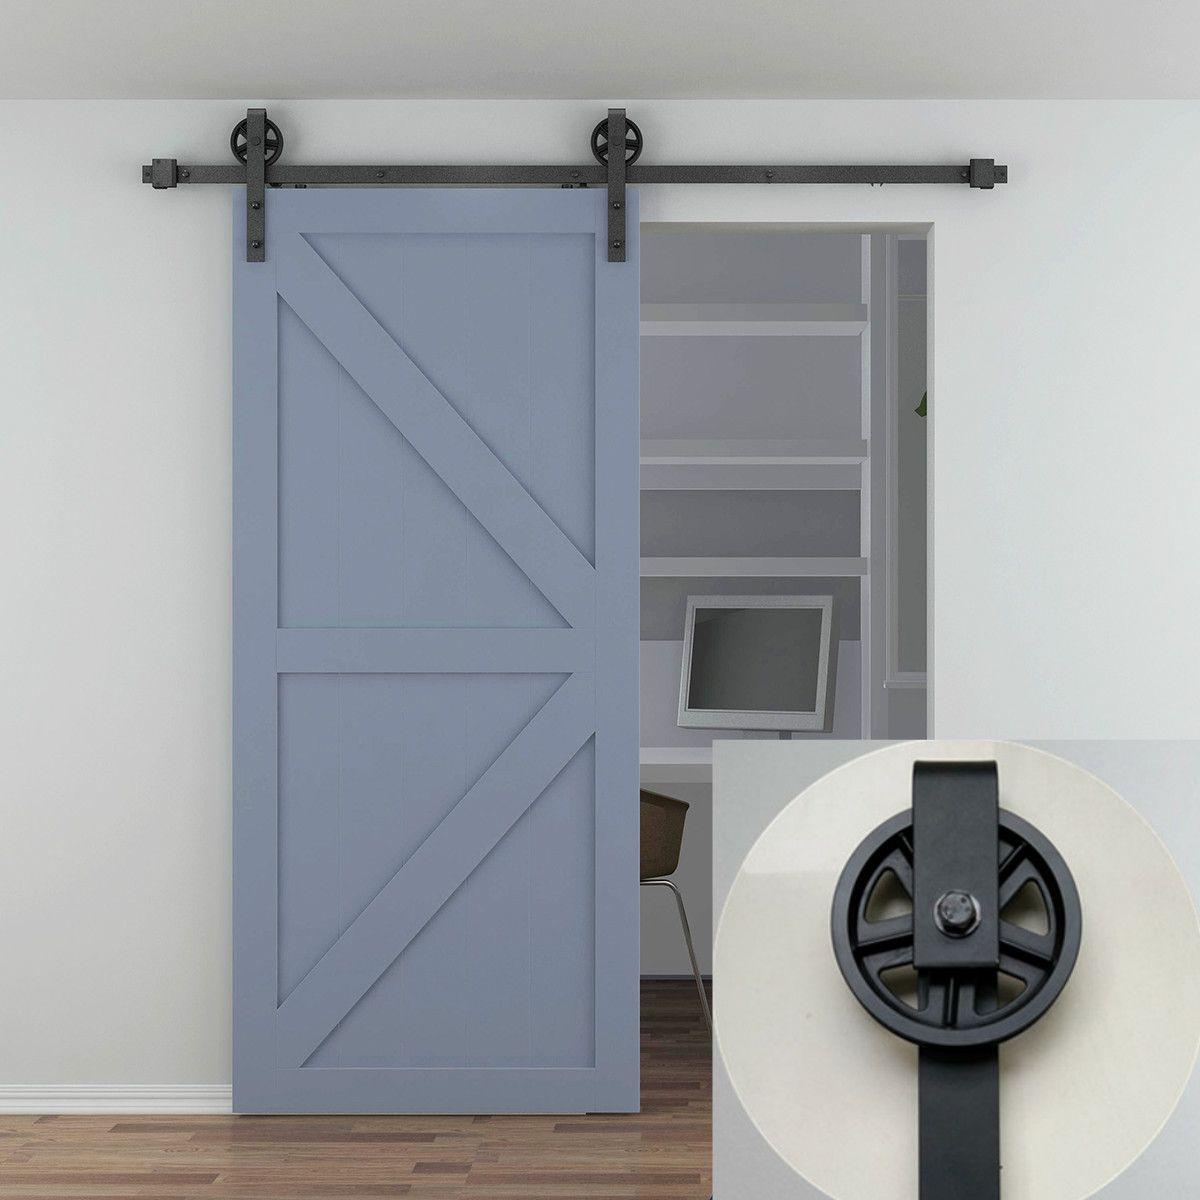 Home Improvement Building Supplies 10ft Euro Stainless Steel Single Sliding Barn Wood Door Closet Hardware Roller Track Set Kit Lovely 5ft